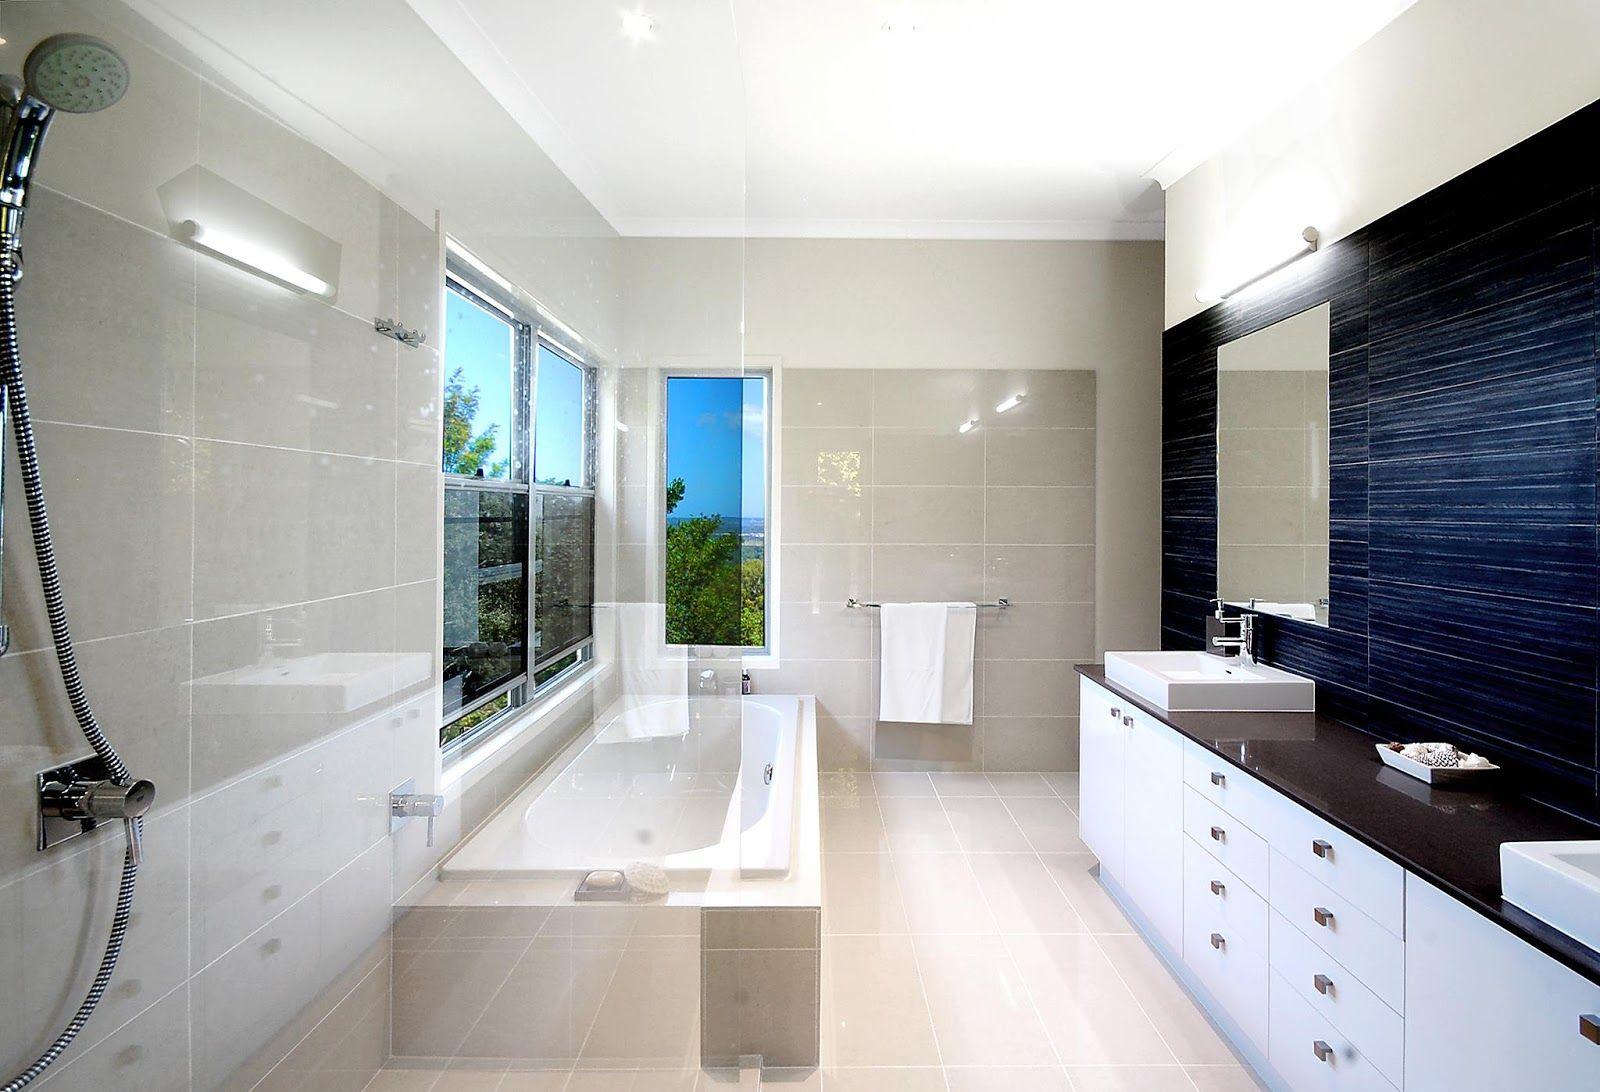 Master Bathroom In A Custom Homegjgardner Homesdo My Brilliant Great Bathroom Ideas Inspiration